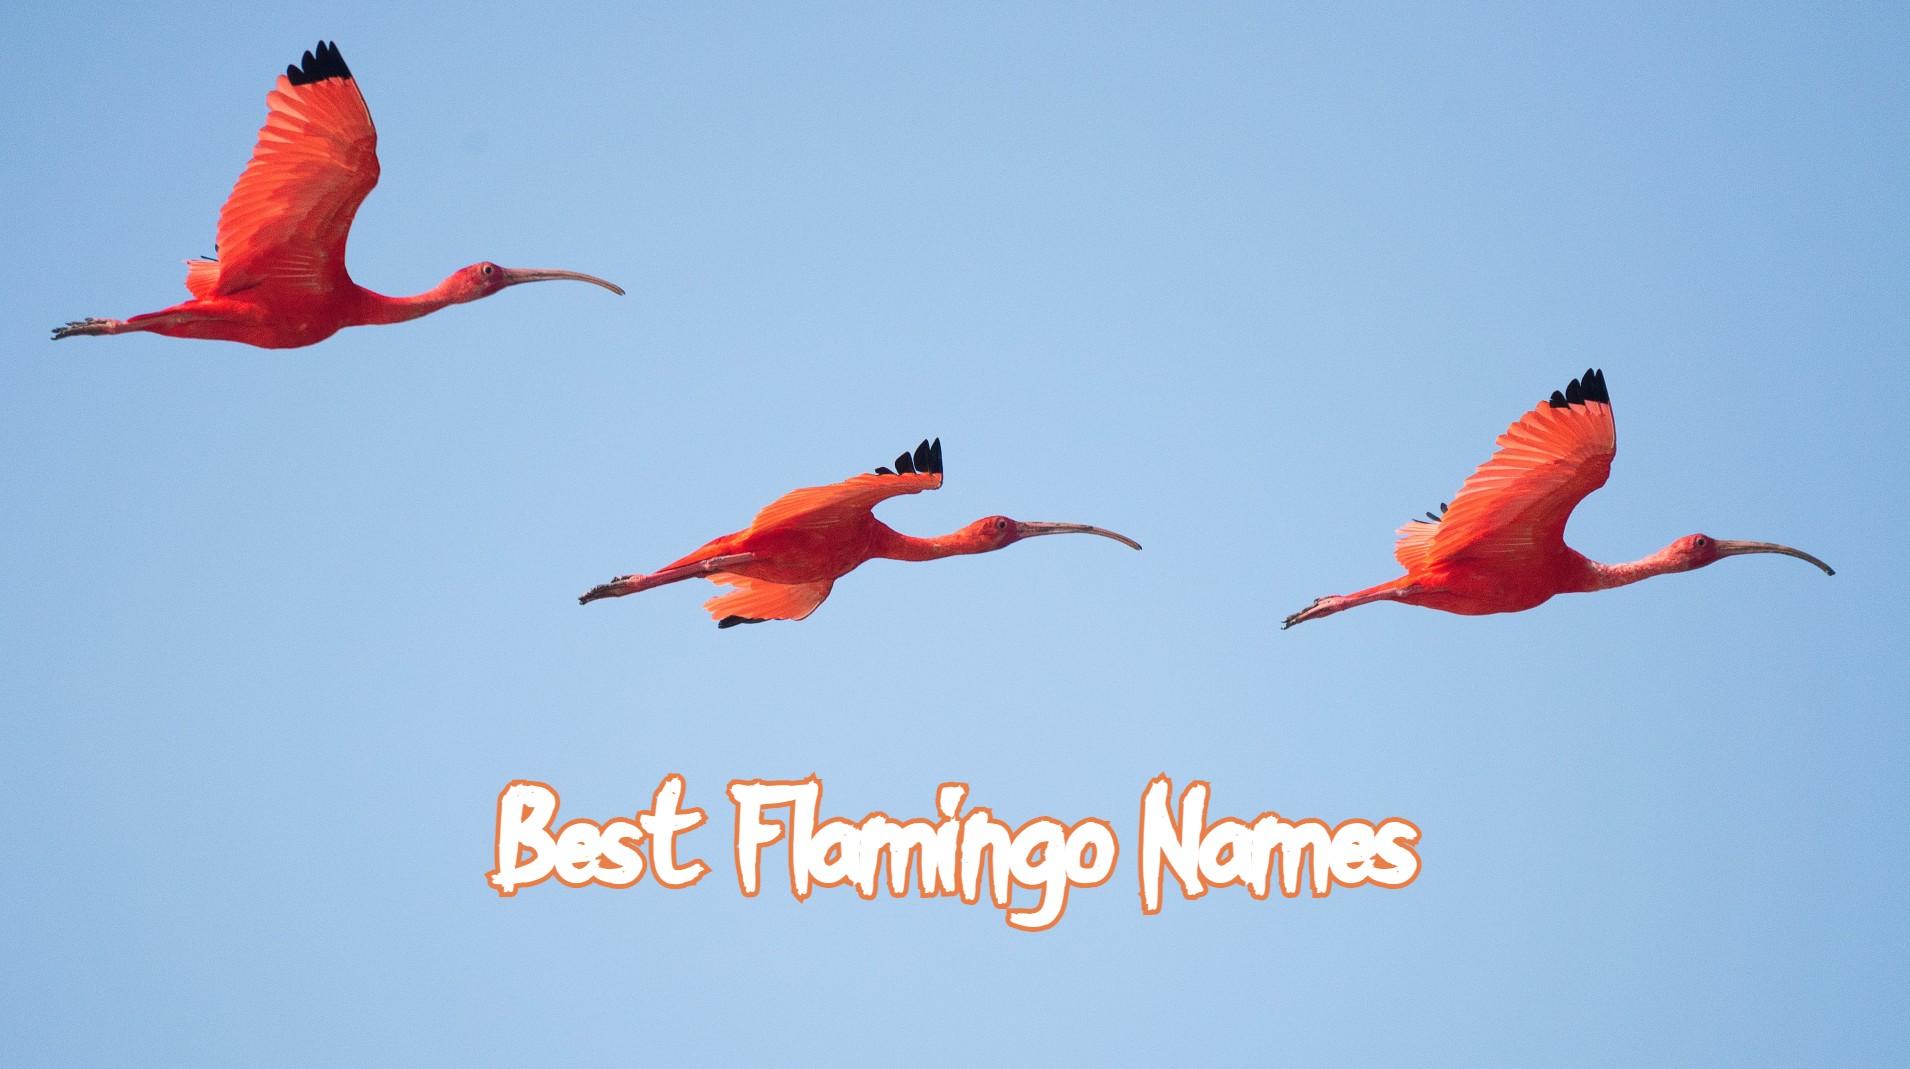 best-flamingo-names